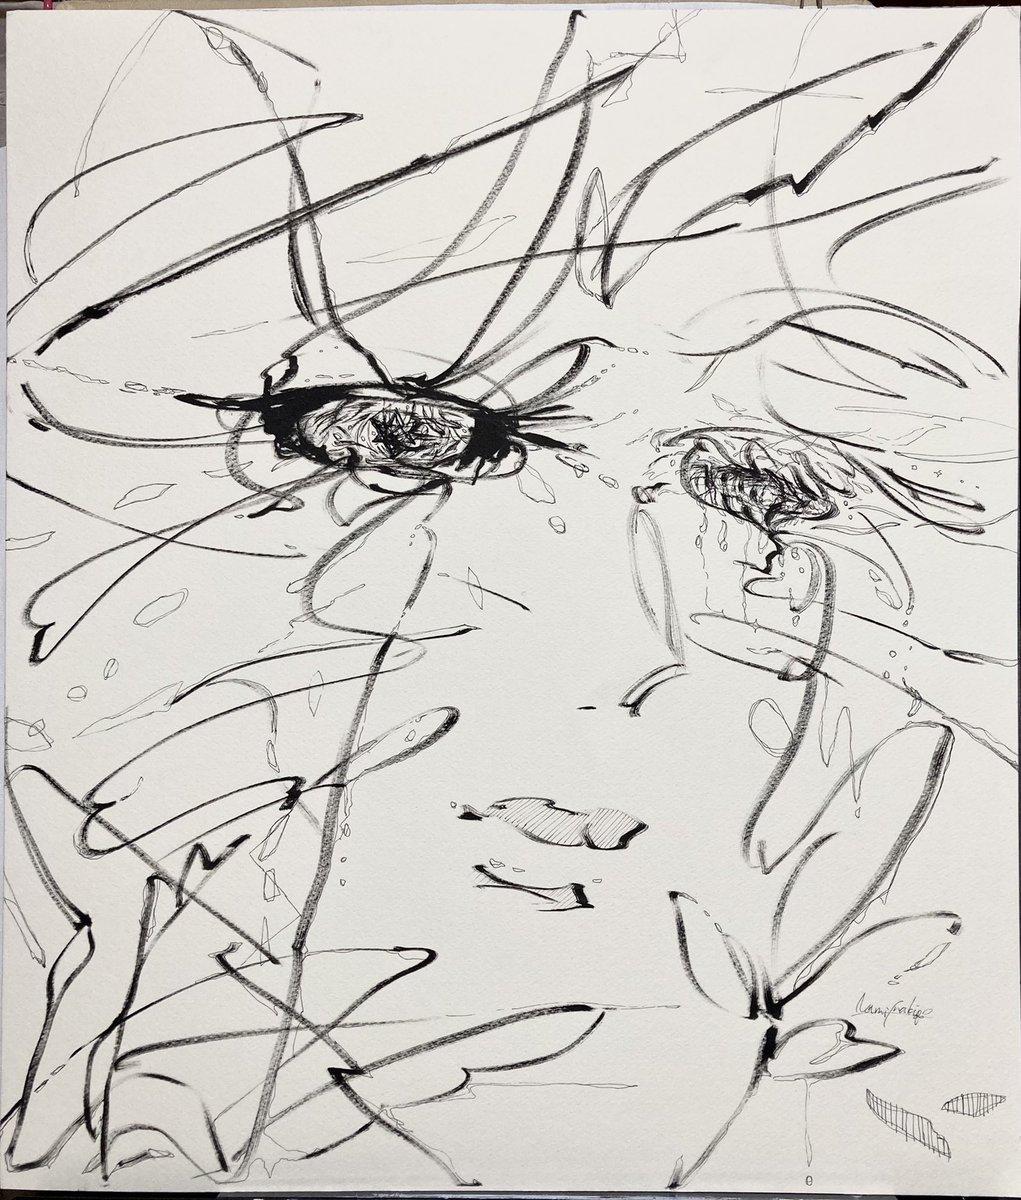 2021/03/03 F10size #crazy #clock #emotional #flowers #hope #tear #silent #energie #naturel #illustration #art #abstractart #pen #drawing #bright #wave #blackandwhite  #抽象画 #ペン画 #アート #ドローイング #絵描きさんと繋がりたい #芸術の輪